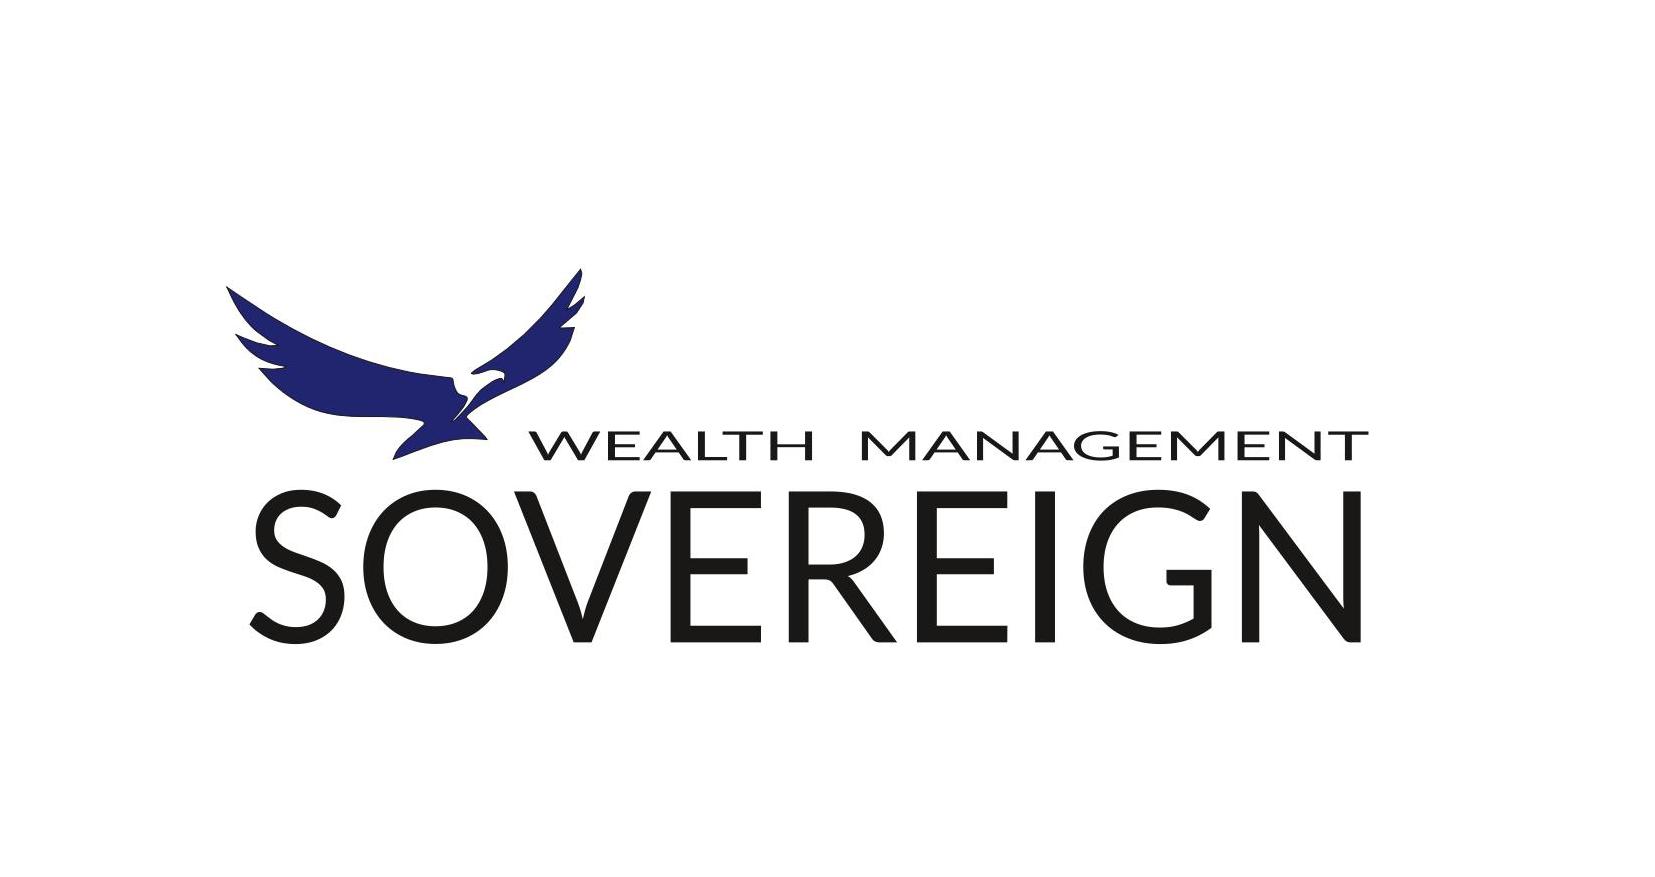 Sovereign LLC